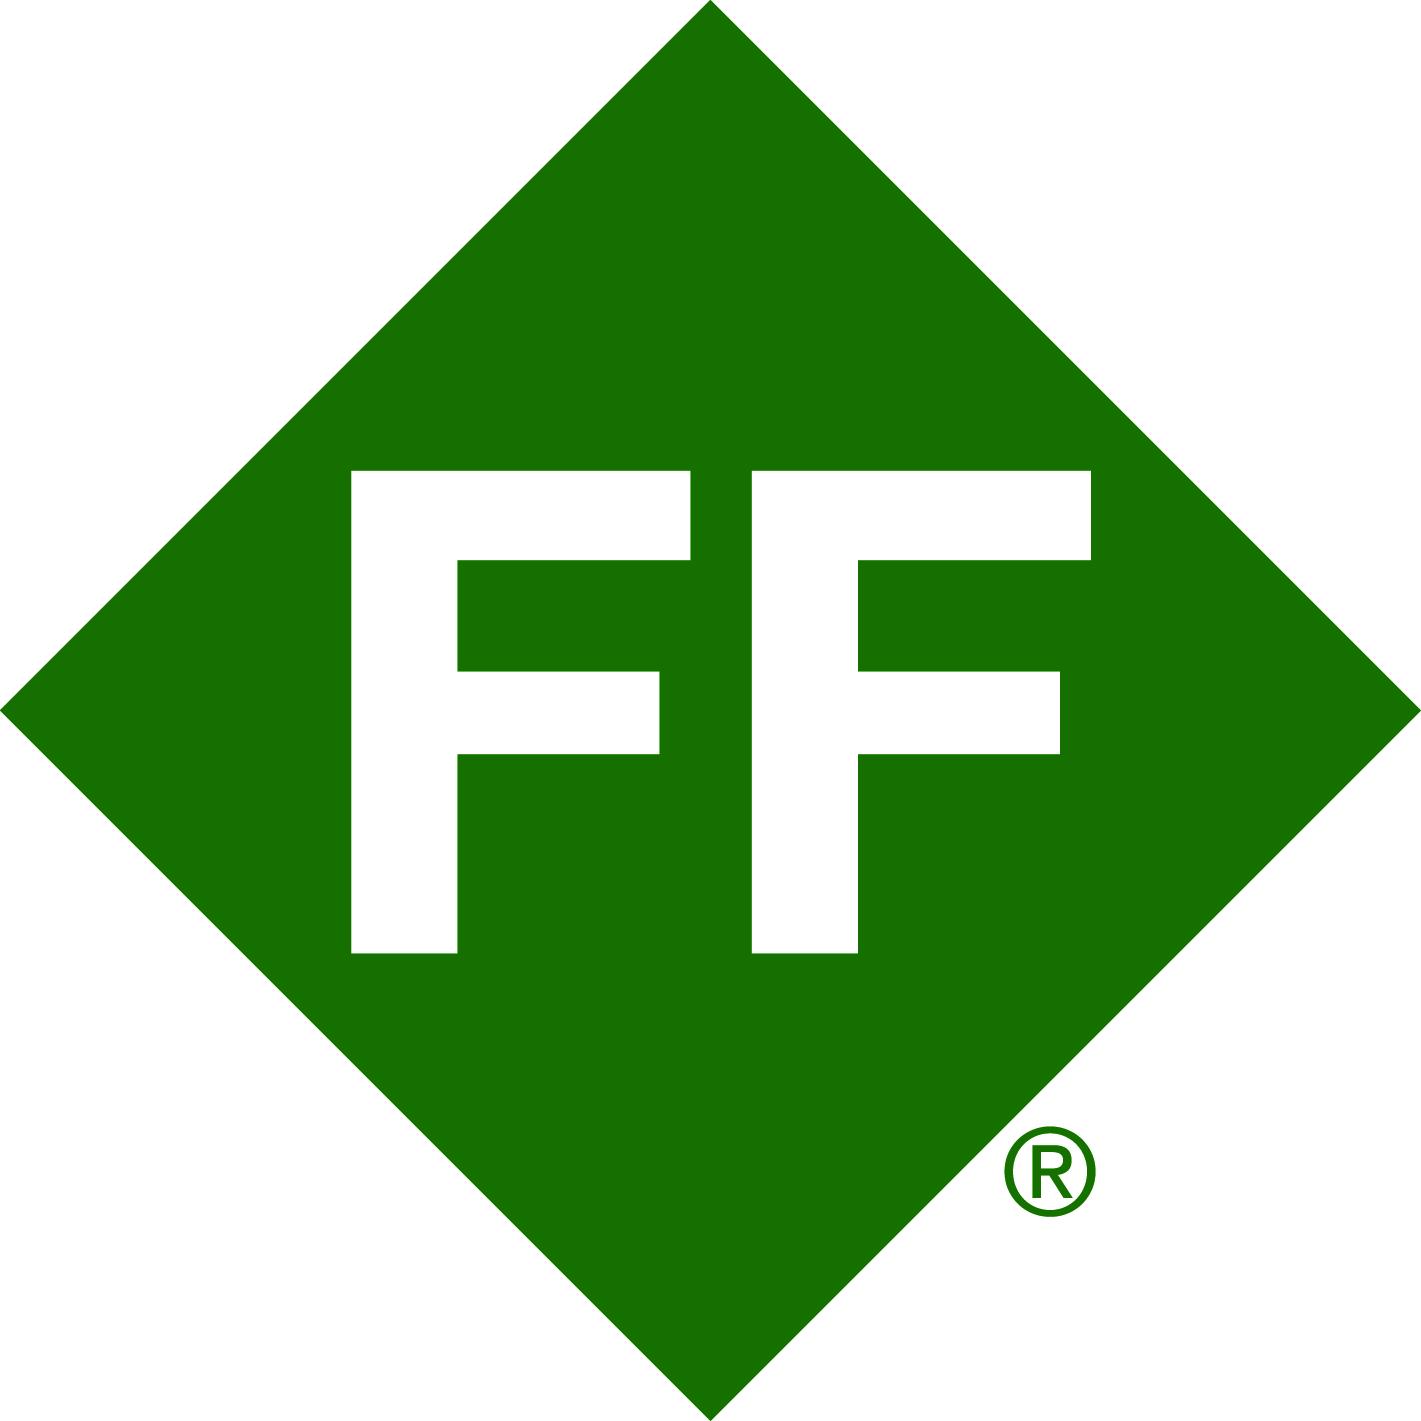 Flagg-Flow Fittings